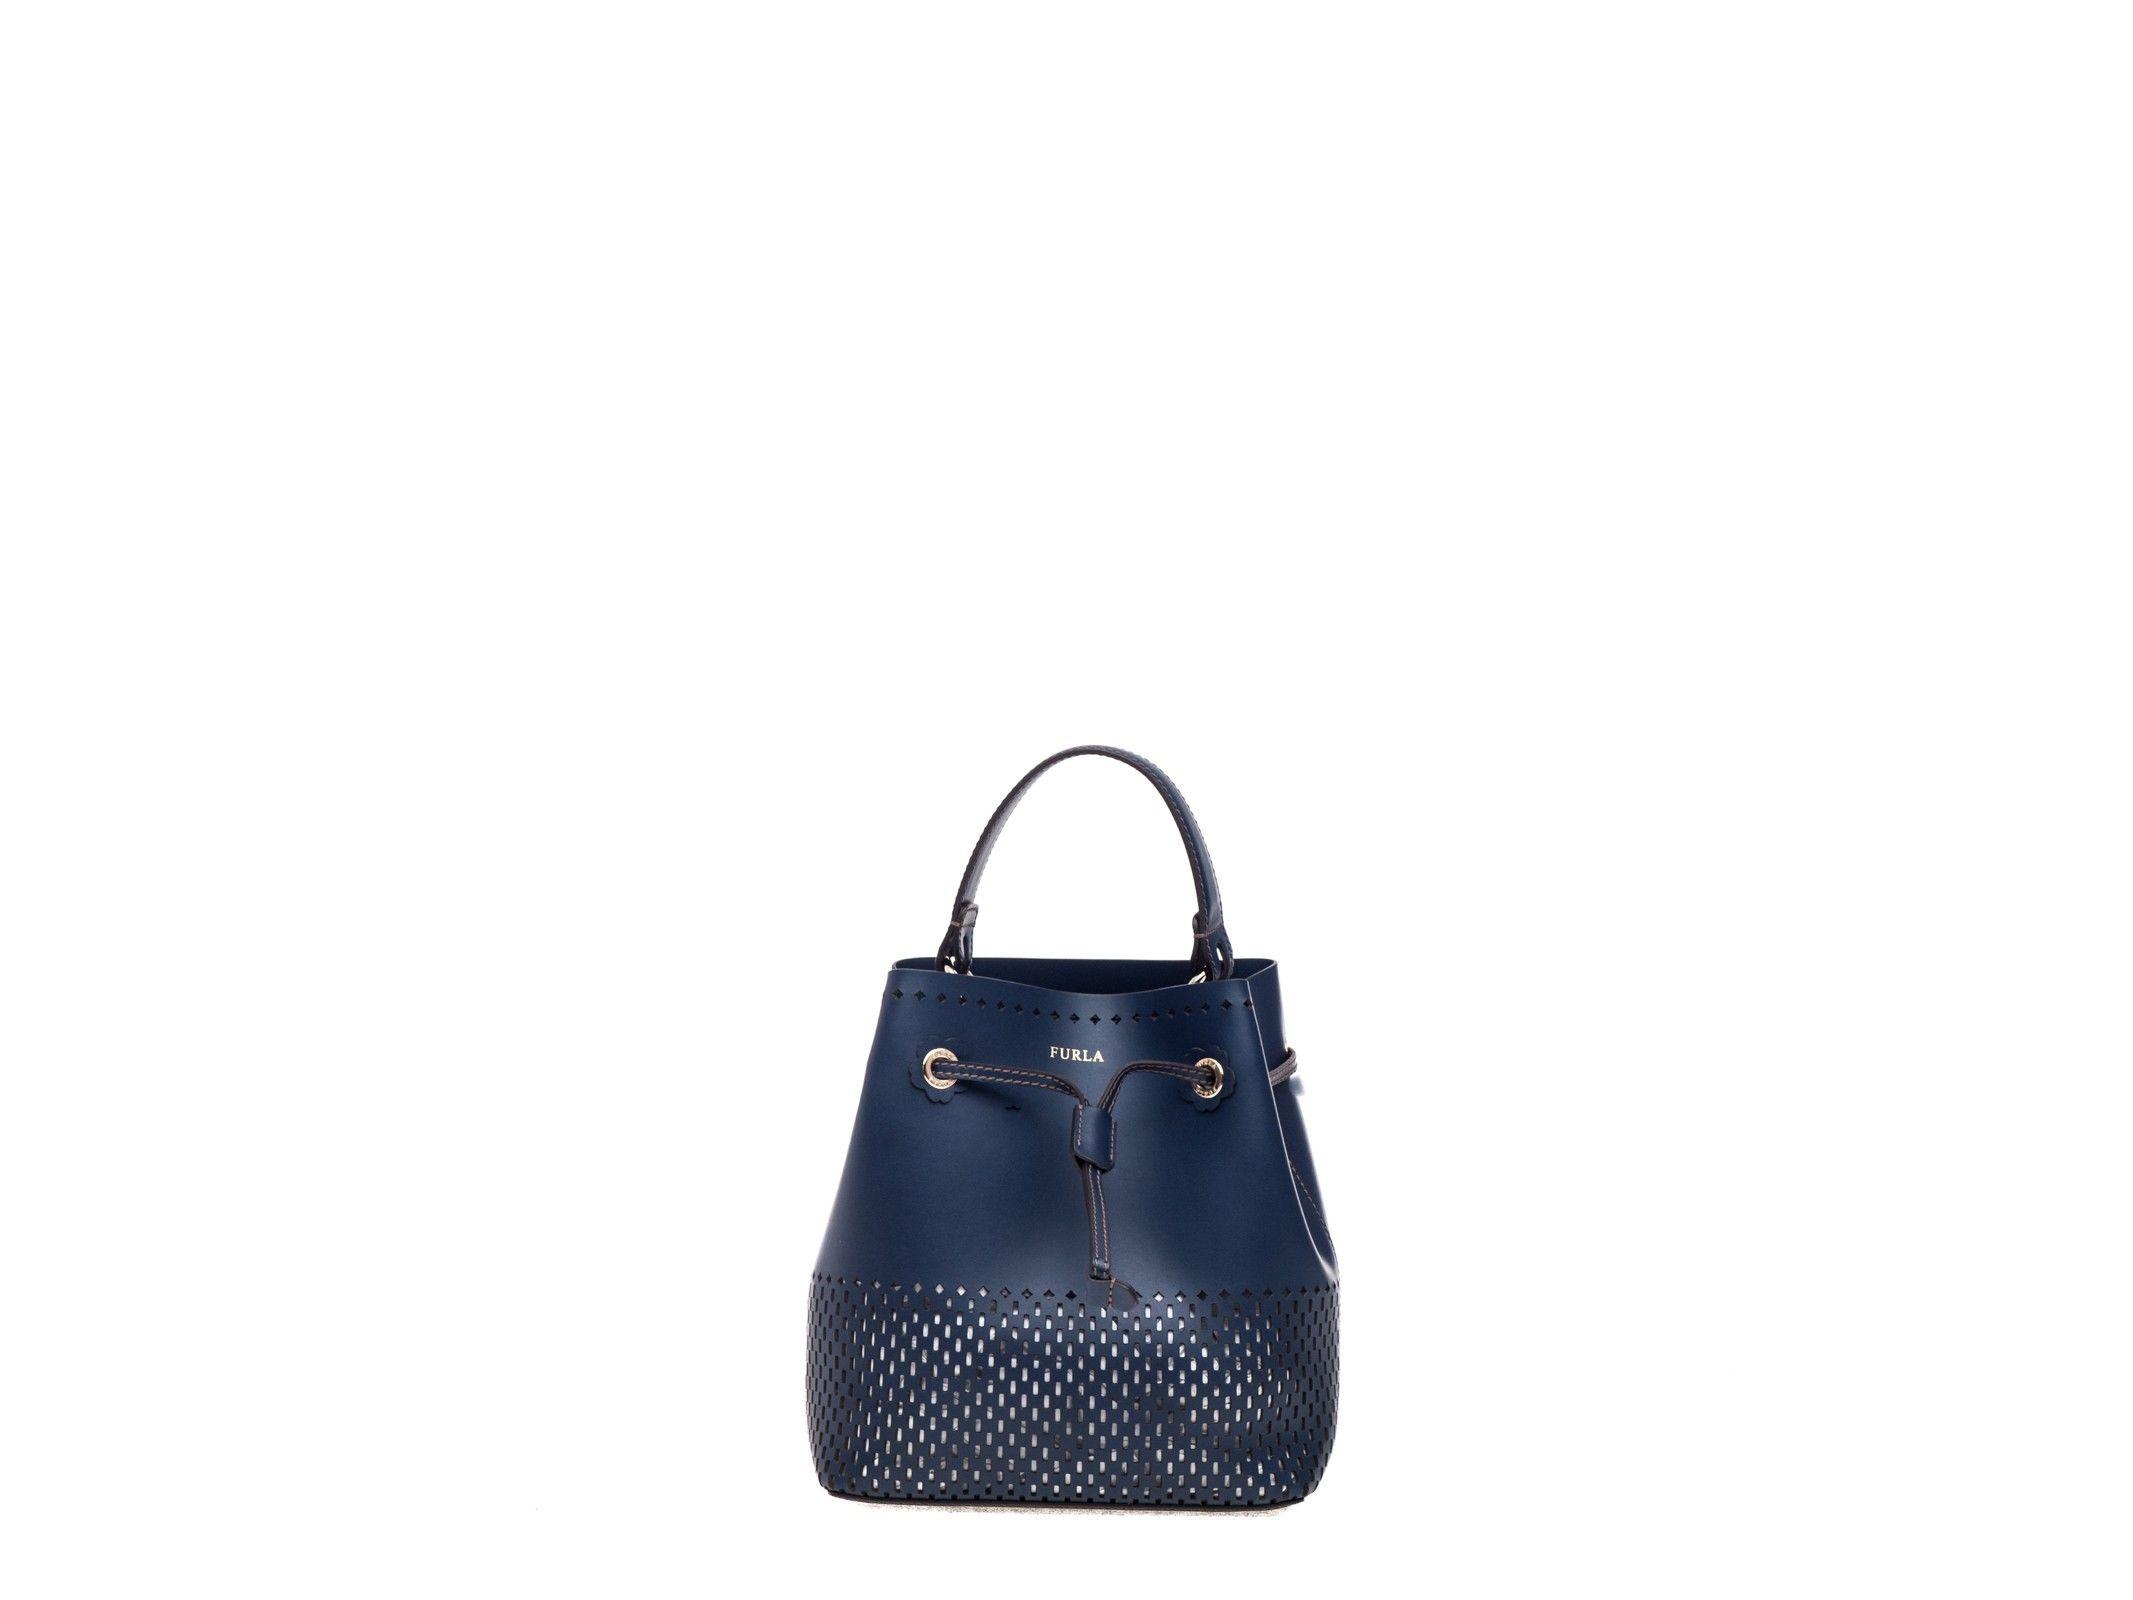 Furla Stacy Bucket Bag Blue